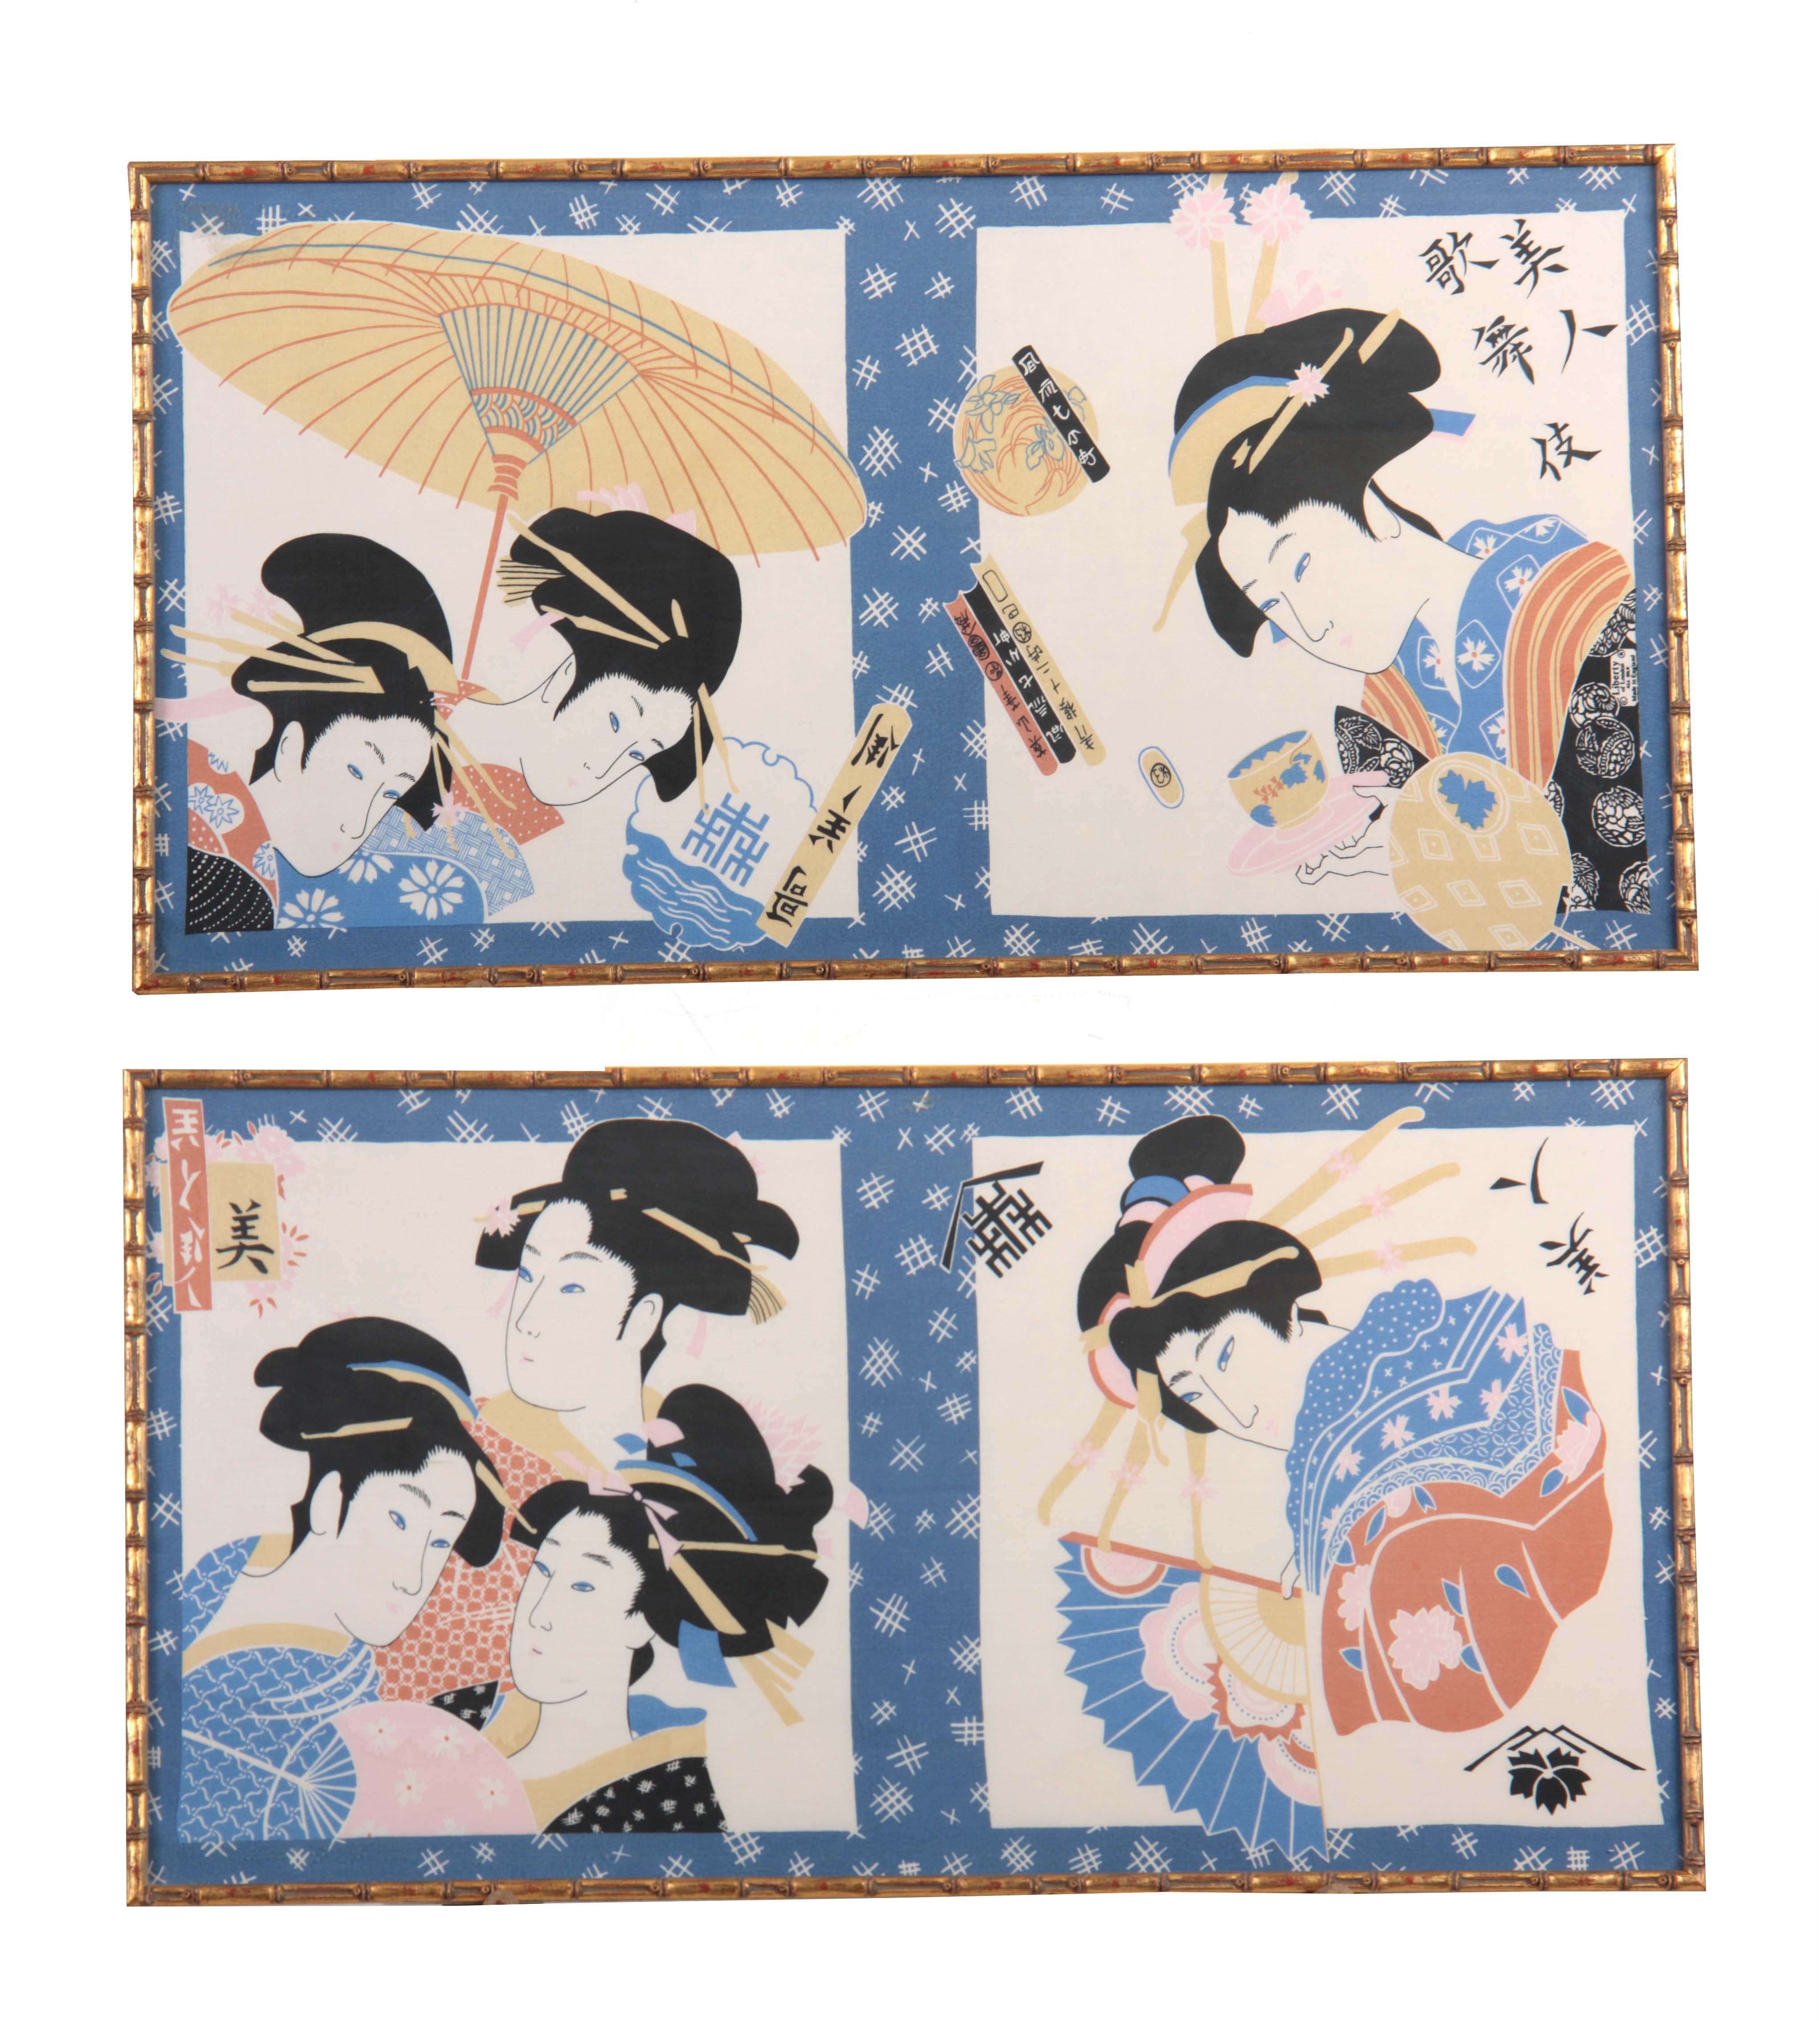 Lot 956 - A PAIR OF JAPANESE DESIGN LIBERTY HAND PRINTED SILKS depicting female Geishas 43cm high 83cm